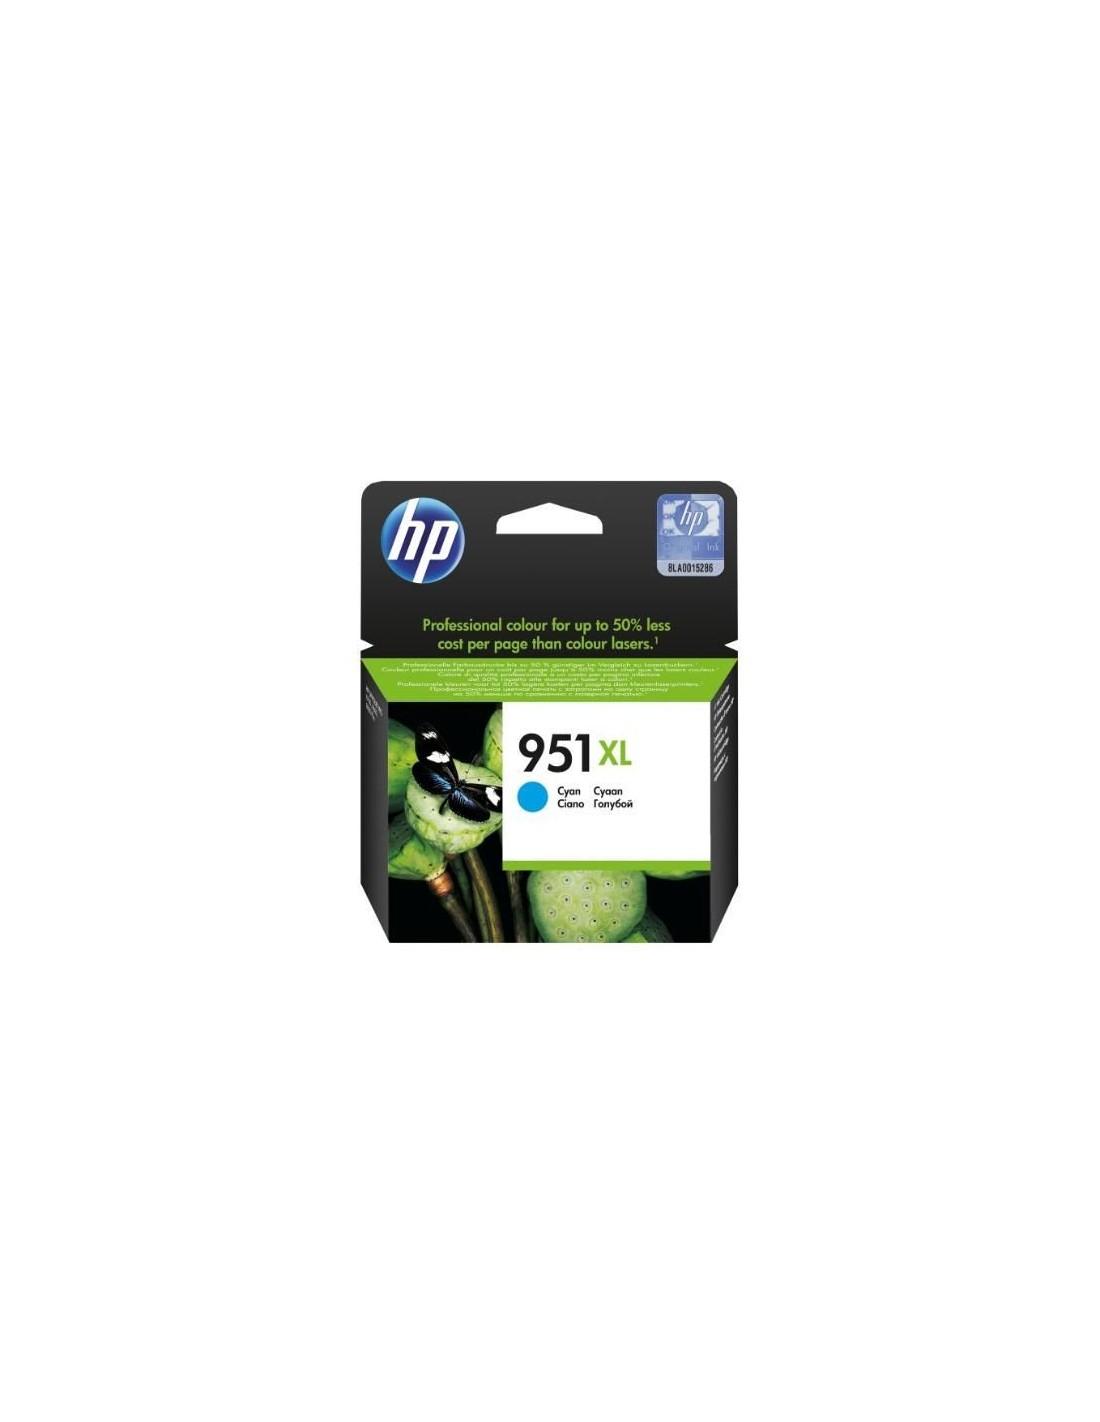 HP Officejet Pro 8100/8600 Cartucho Cian Nº951XL